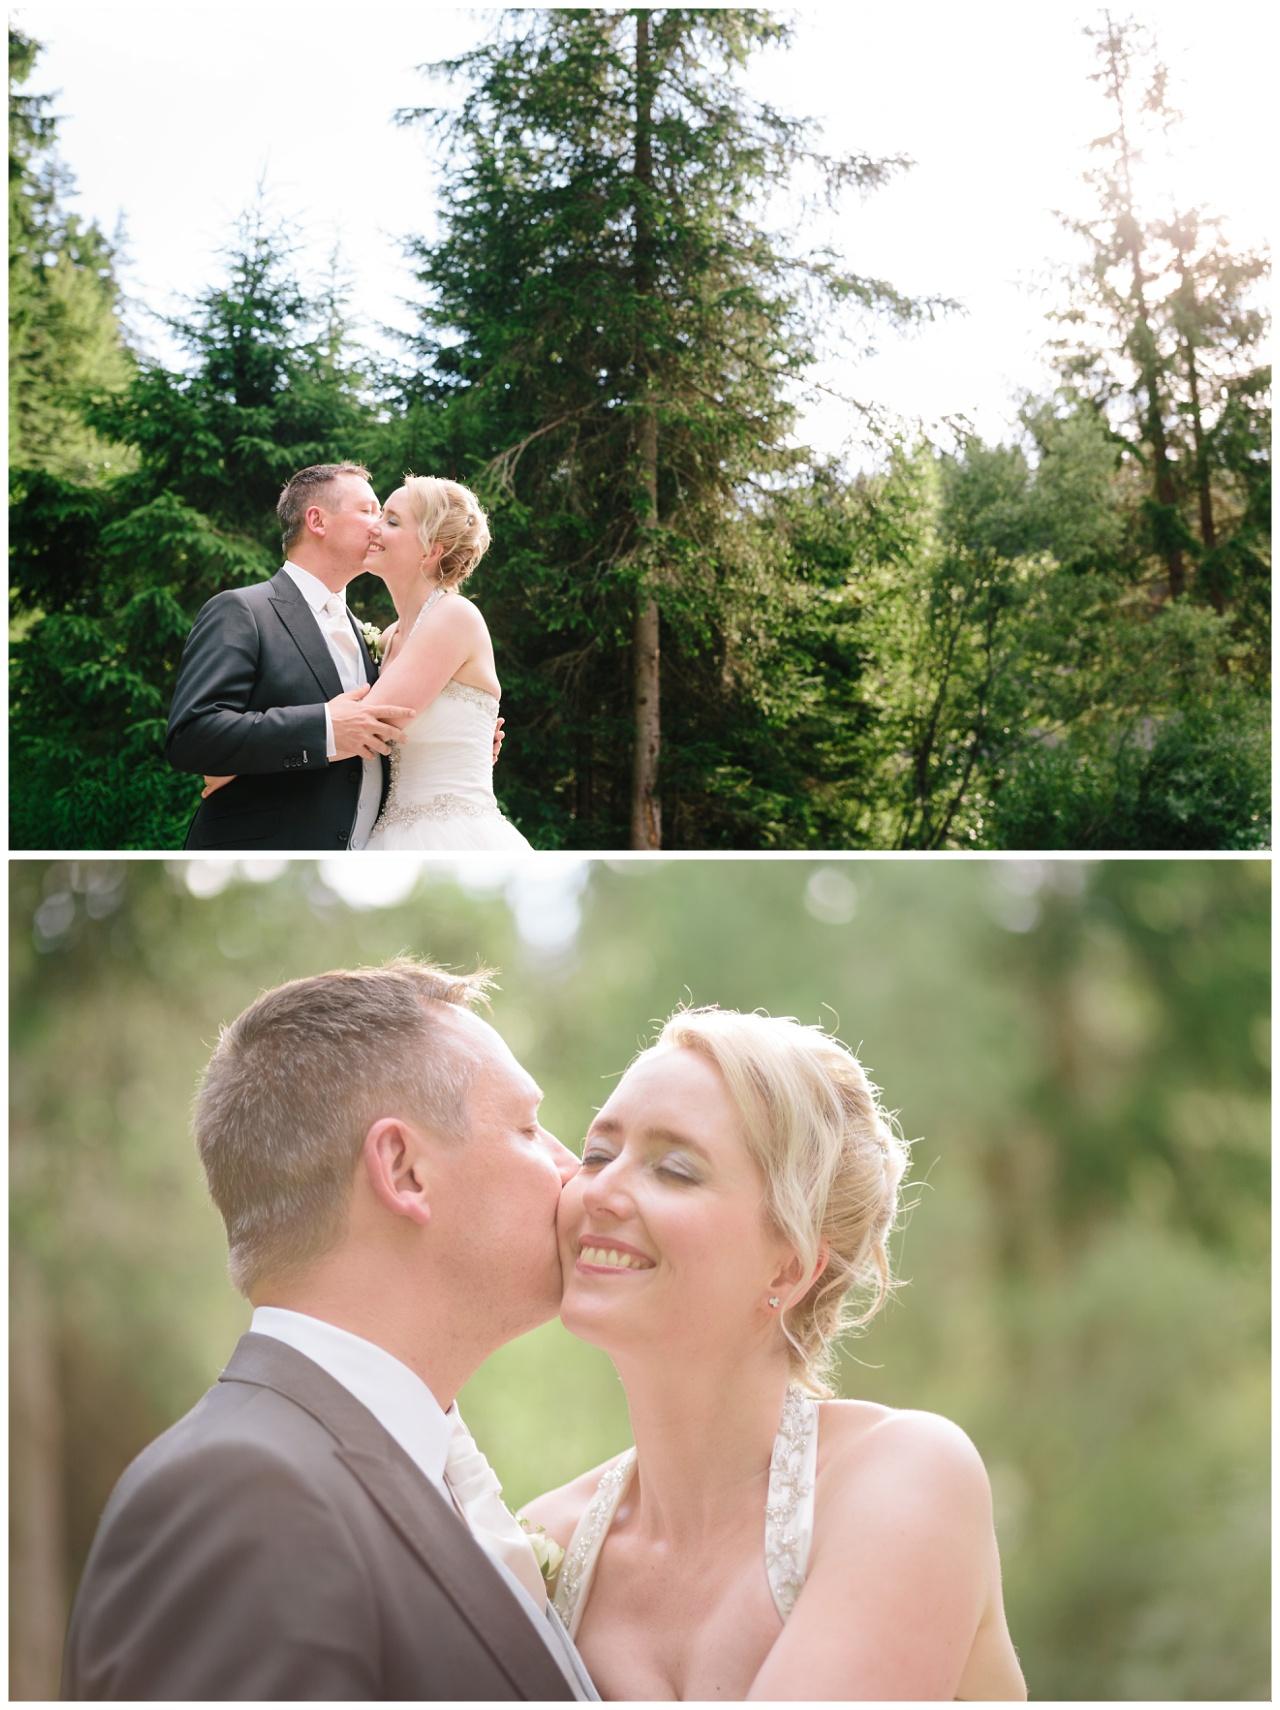 Hochzeitsfotograf Seefeld Triendlsaege 15